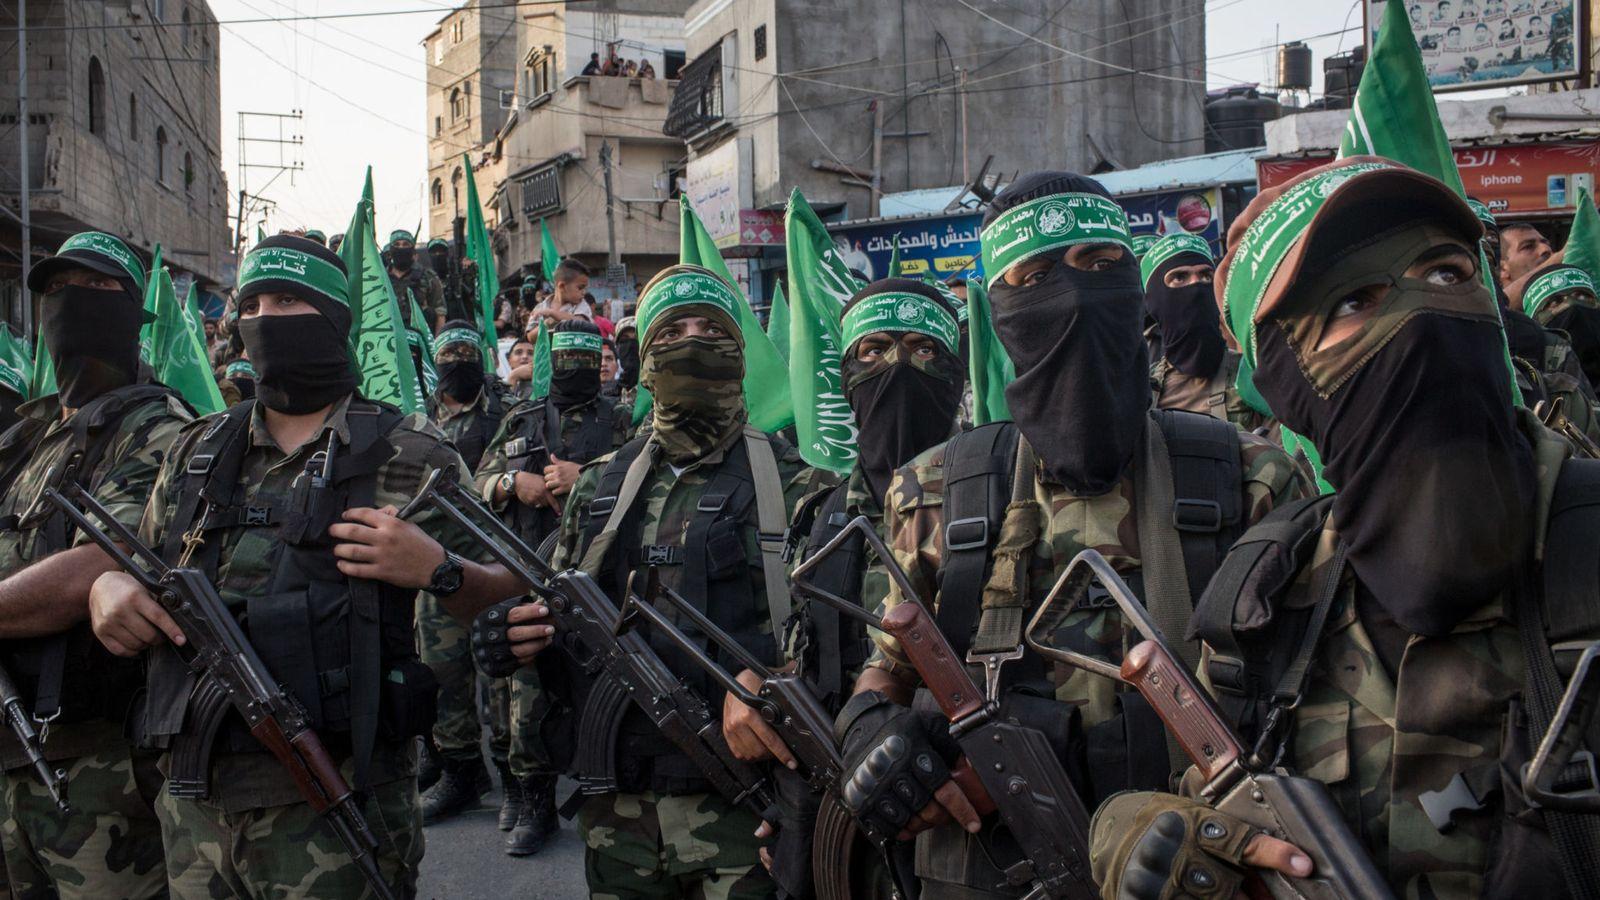 Grupo terrorista palestino obtuvo financiación en bitcoin desde 2015 hasta 2019 según reporte